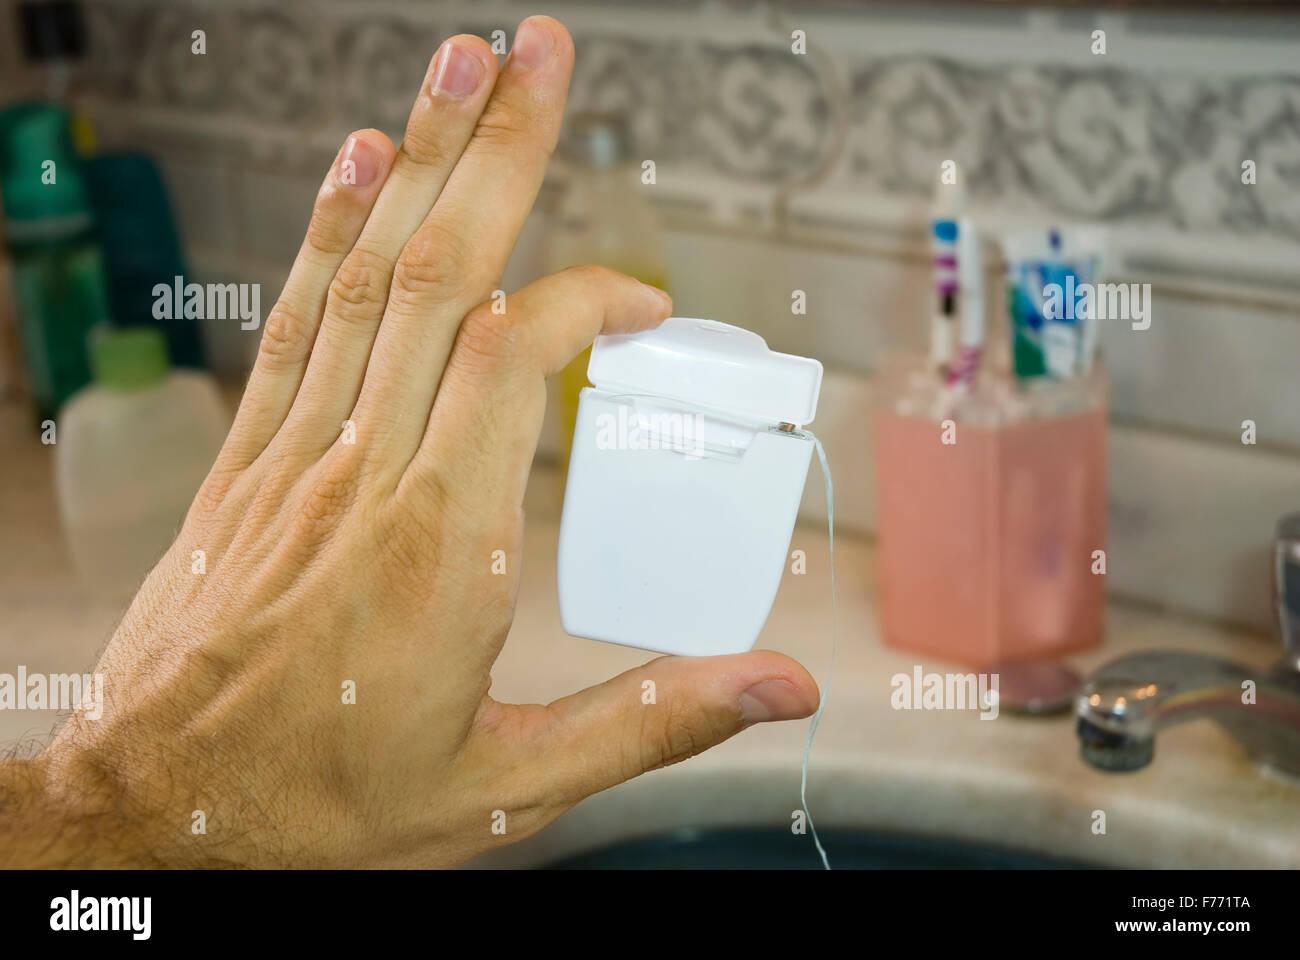 Hand holding dental floss box - Stock Image